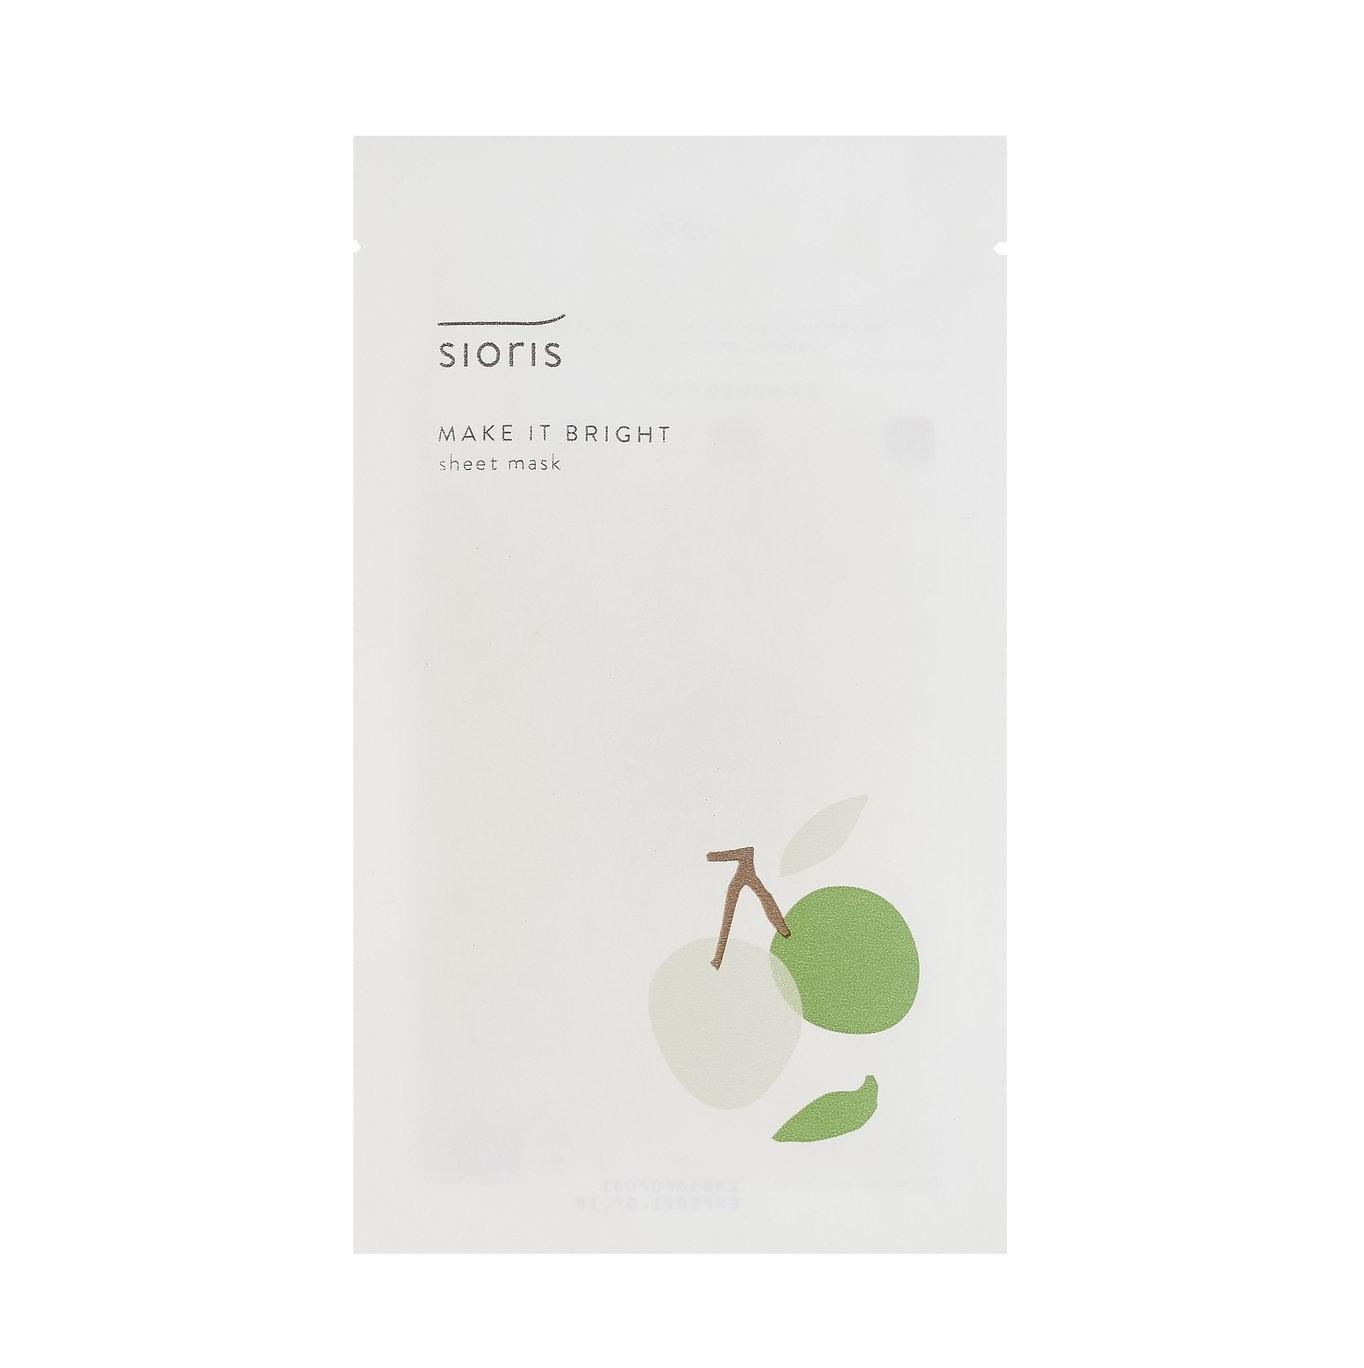 SIORIS-make-it-bright-sheet-mask-avis-review-masque-tissu-coreen-clean